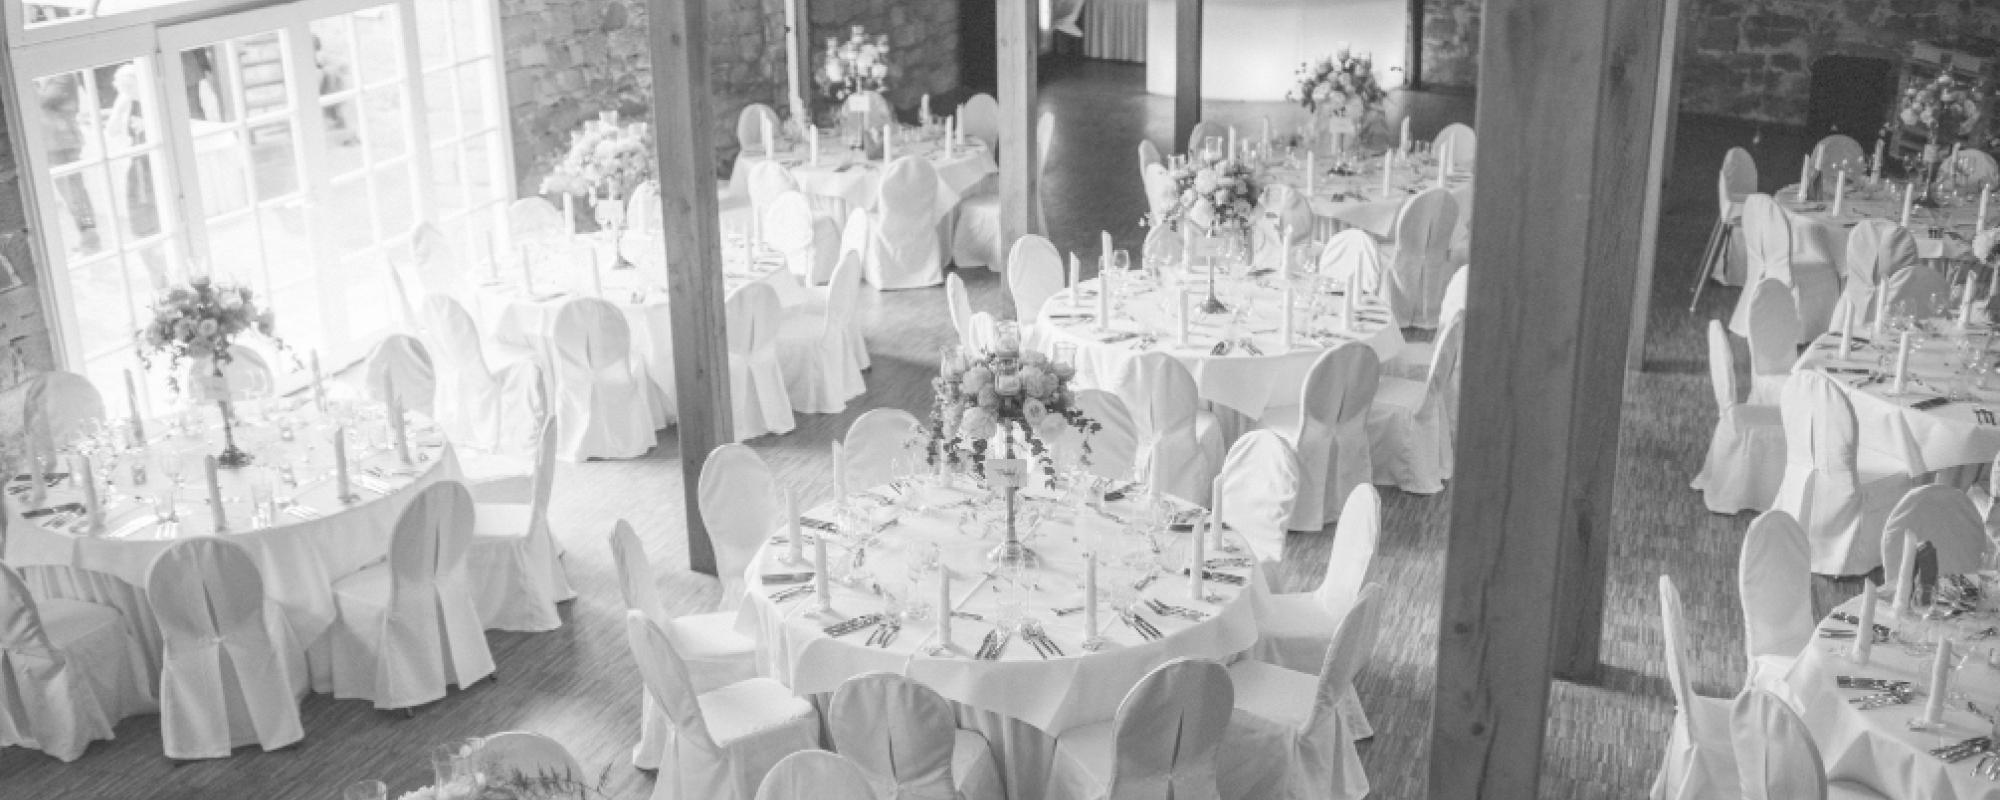 Passiamour Hochzeitsplanung